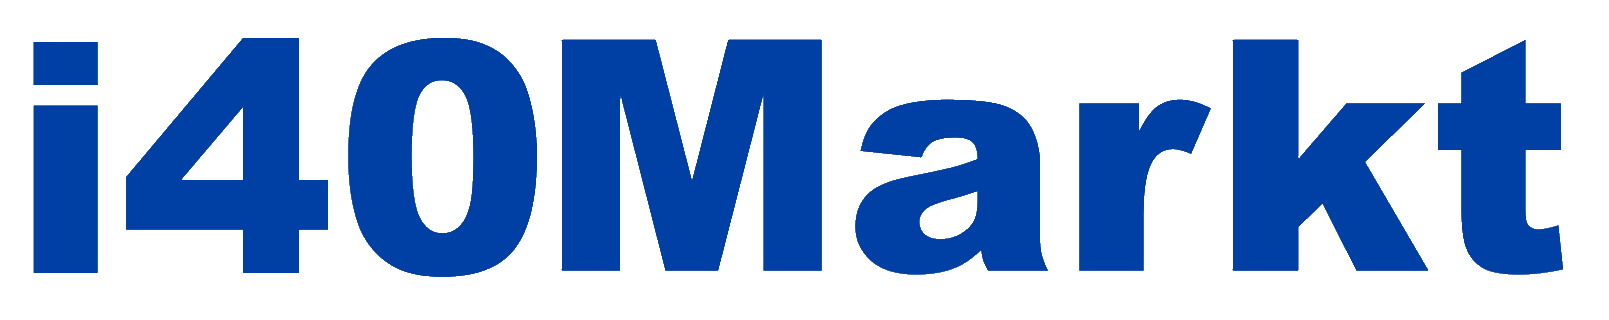 i40Markt